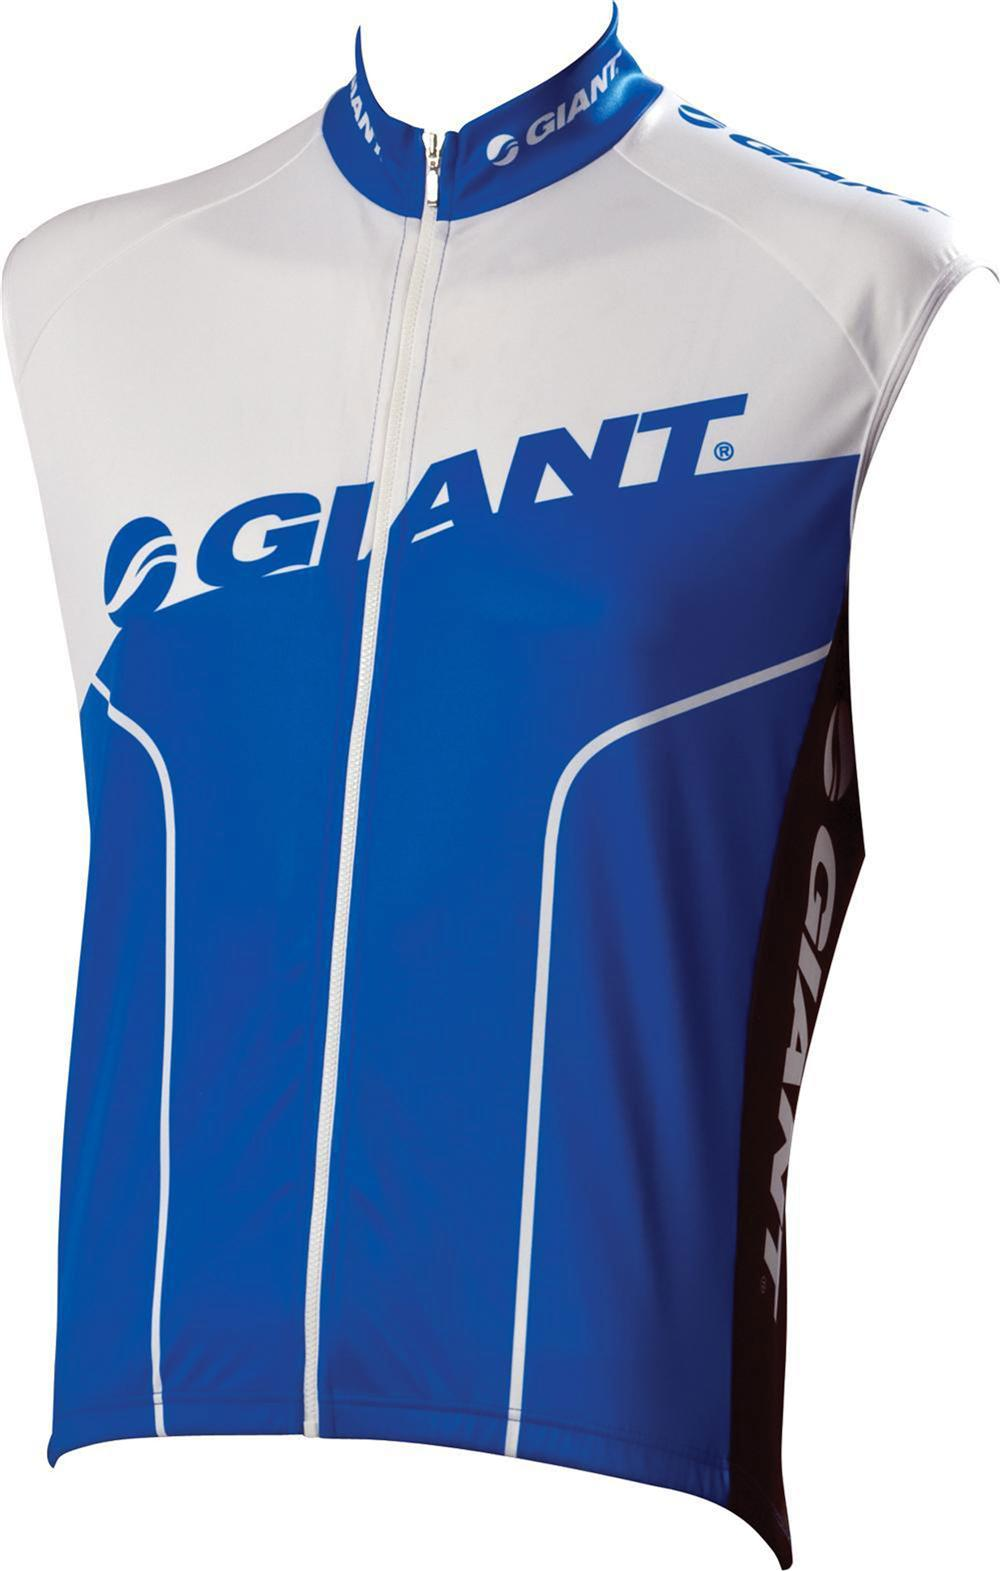 Team USA Men s Apparel, US Olympic Team Clothing For Men, Gear